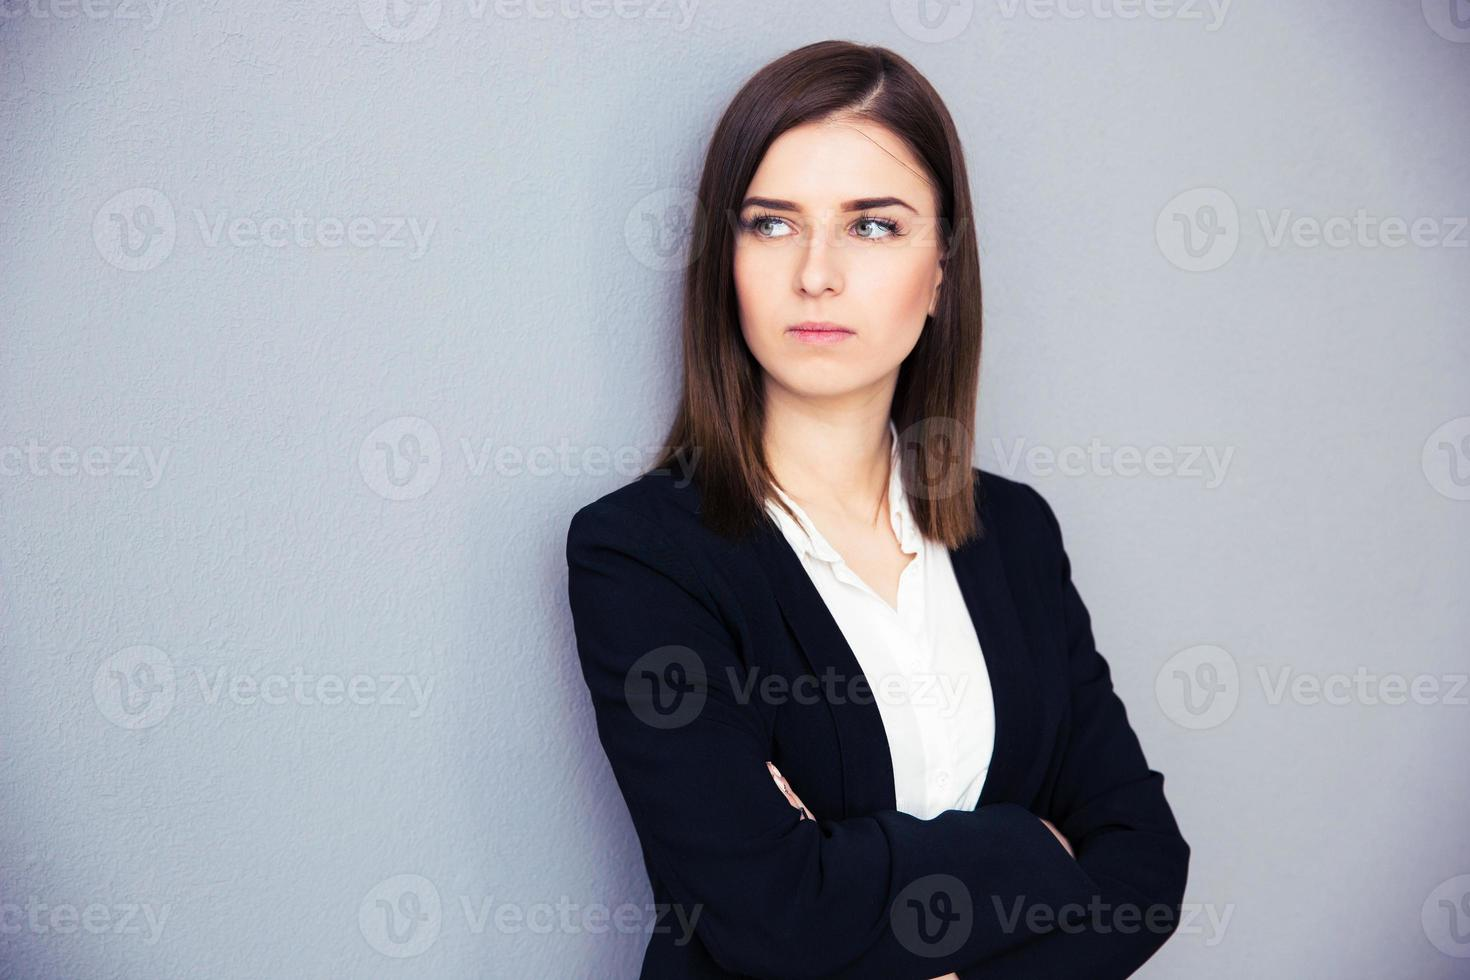 giovane imprenditrice seria con le braccia conserte foto